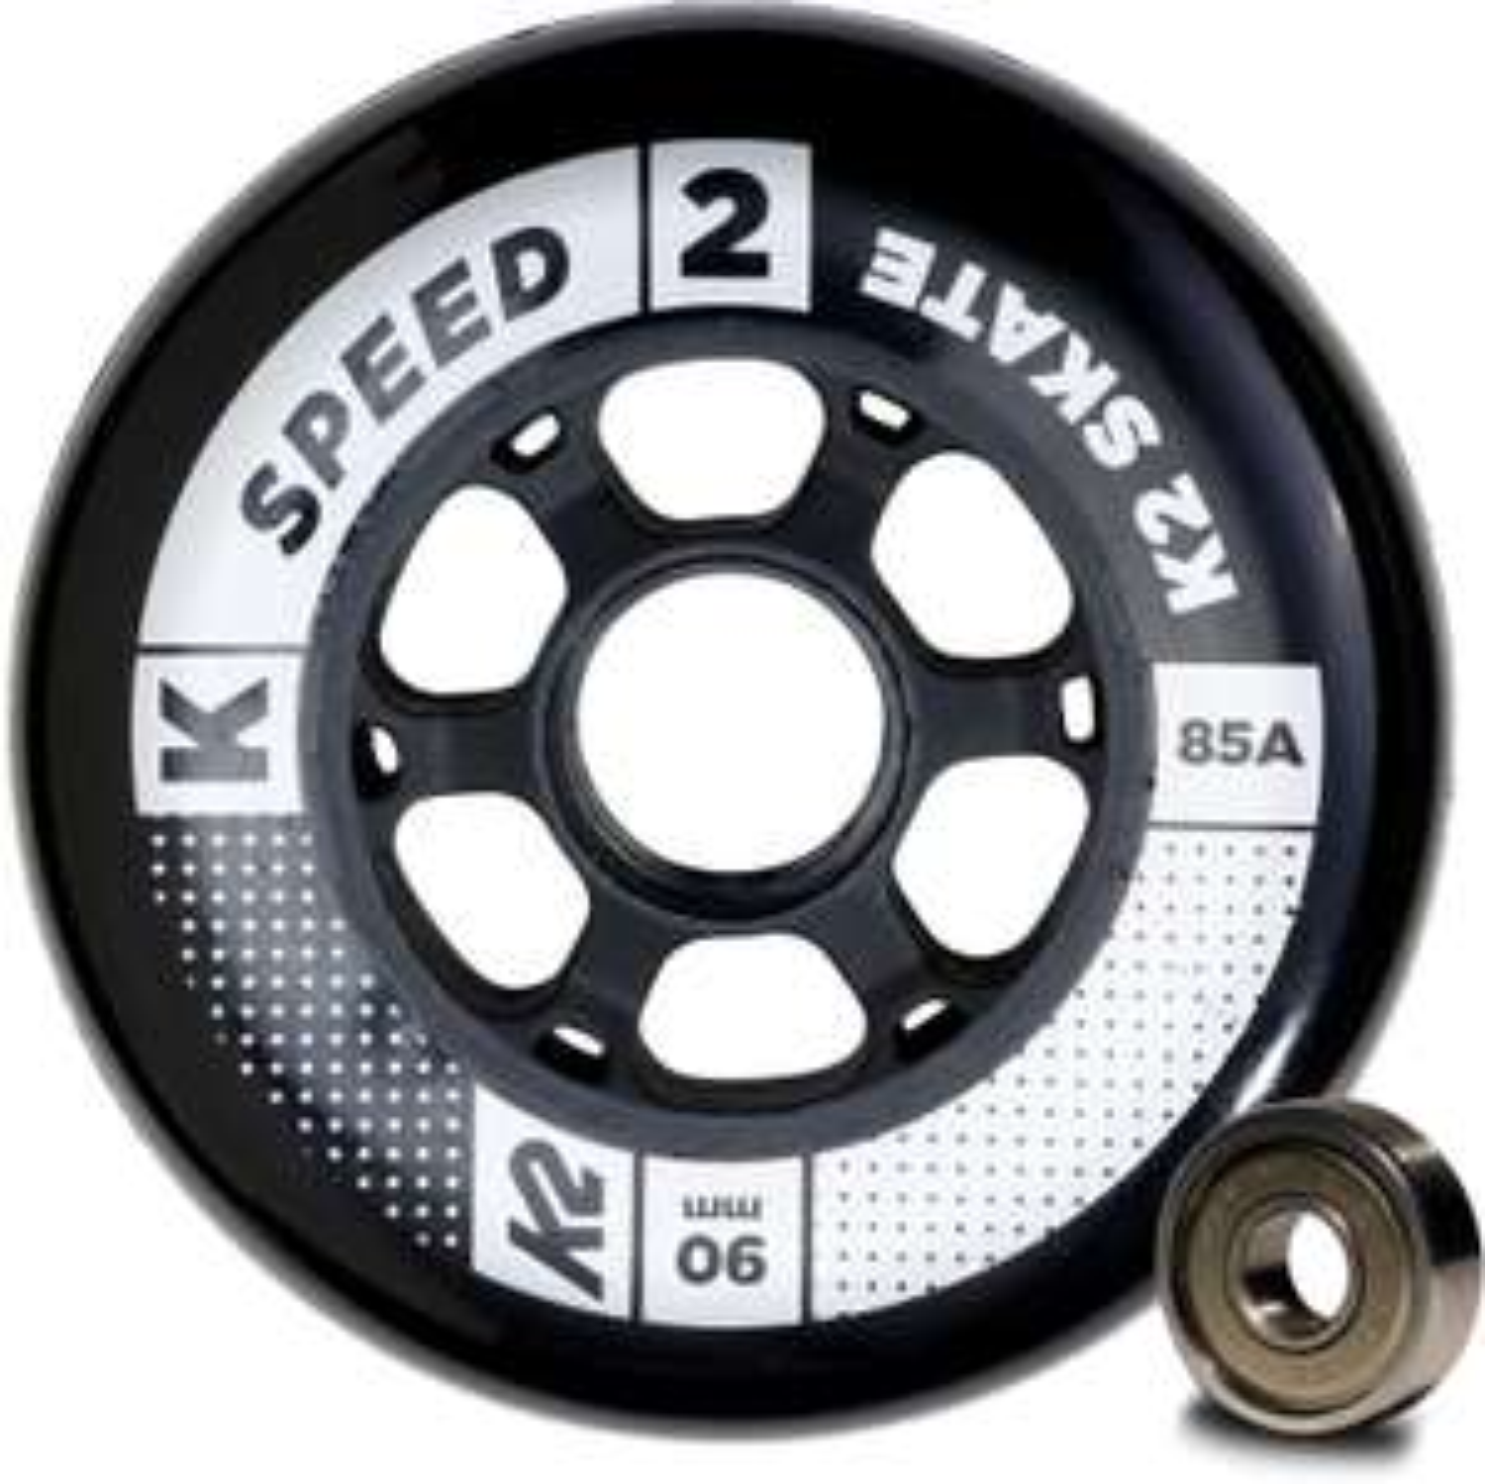 8x K2 skate wielen 90mm incl. ILQ9 lagers